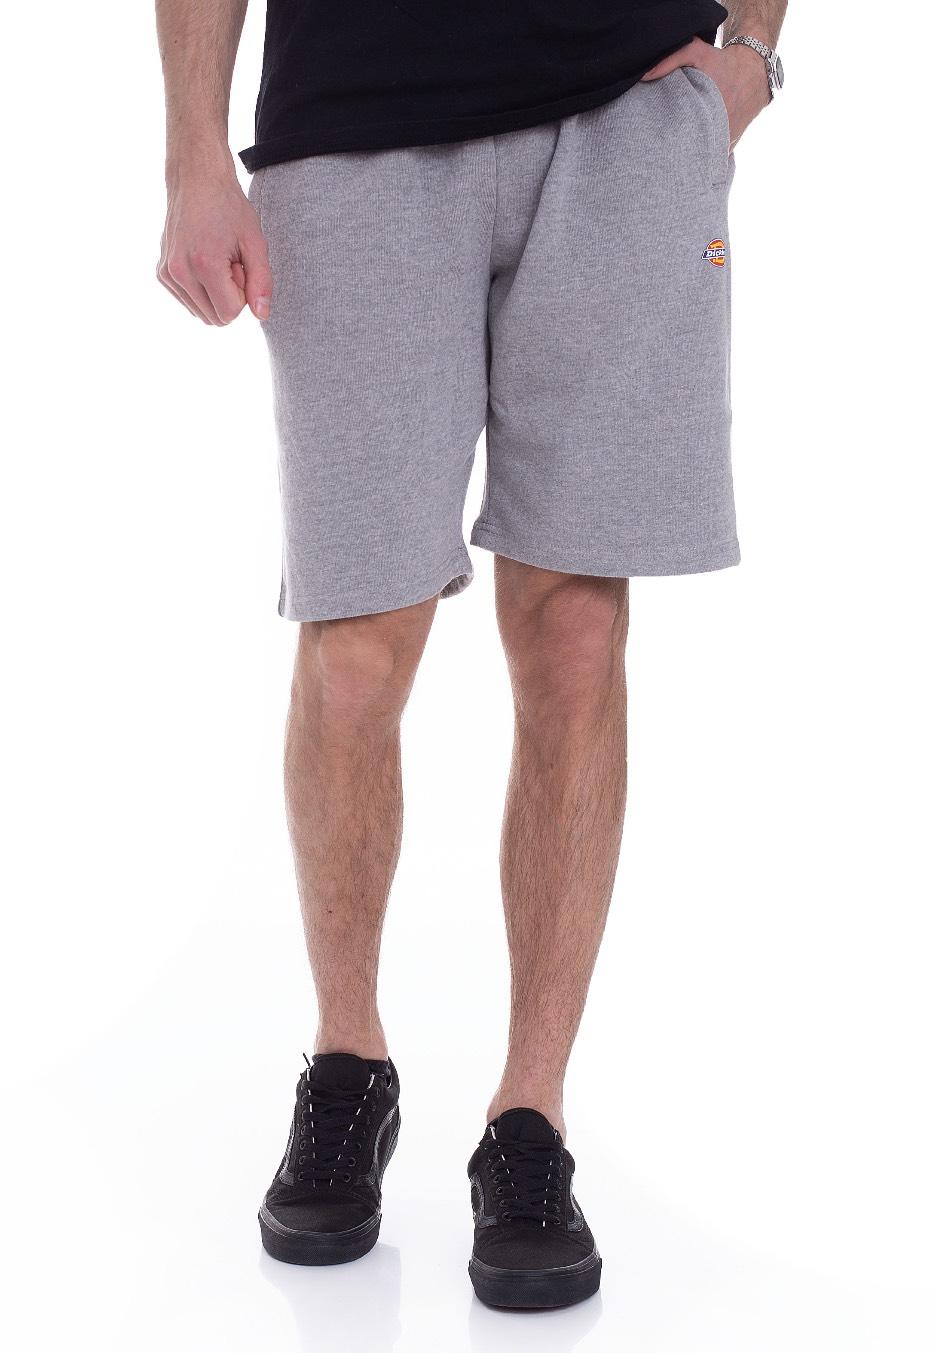 398162bf56d Dickies - Glen Cove Grey Melange - Shorts - Impericon.com SE